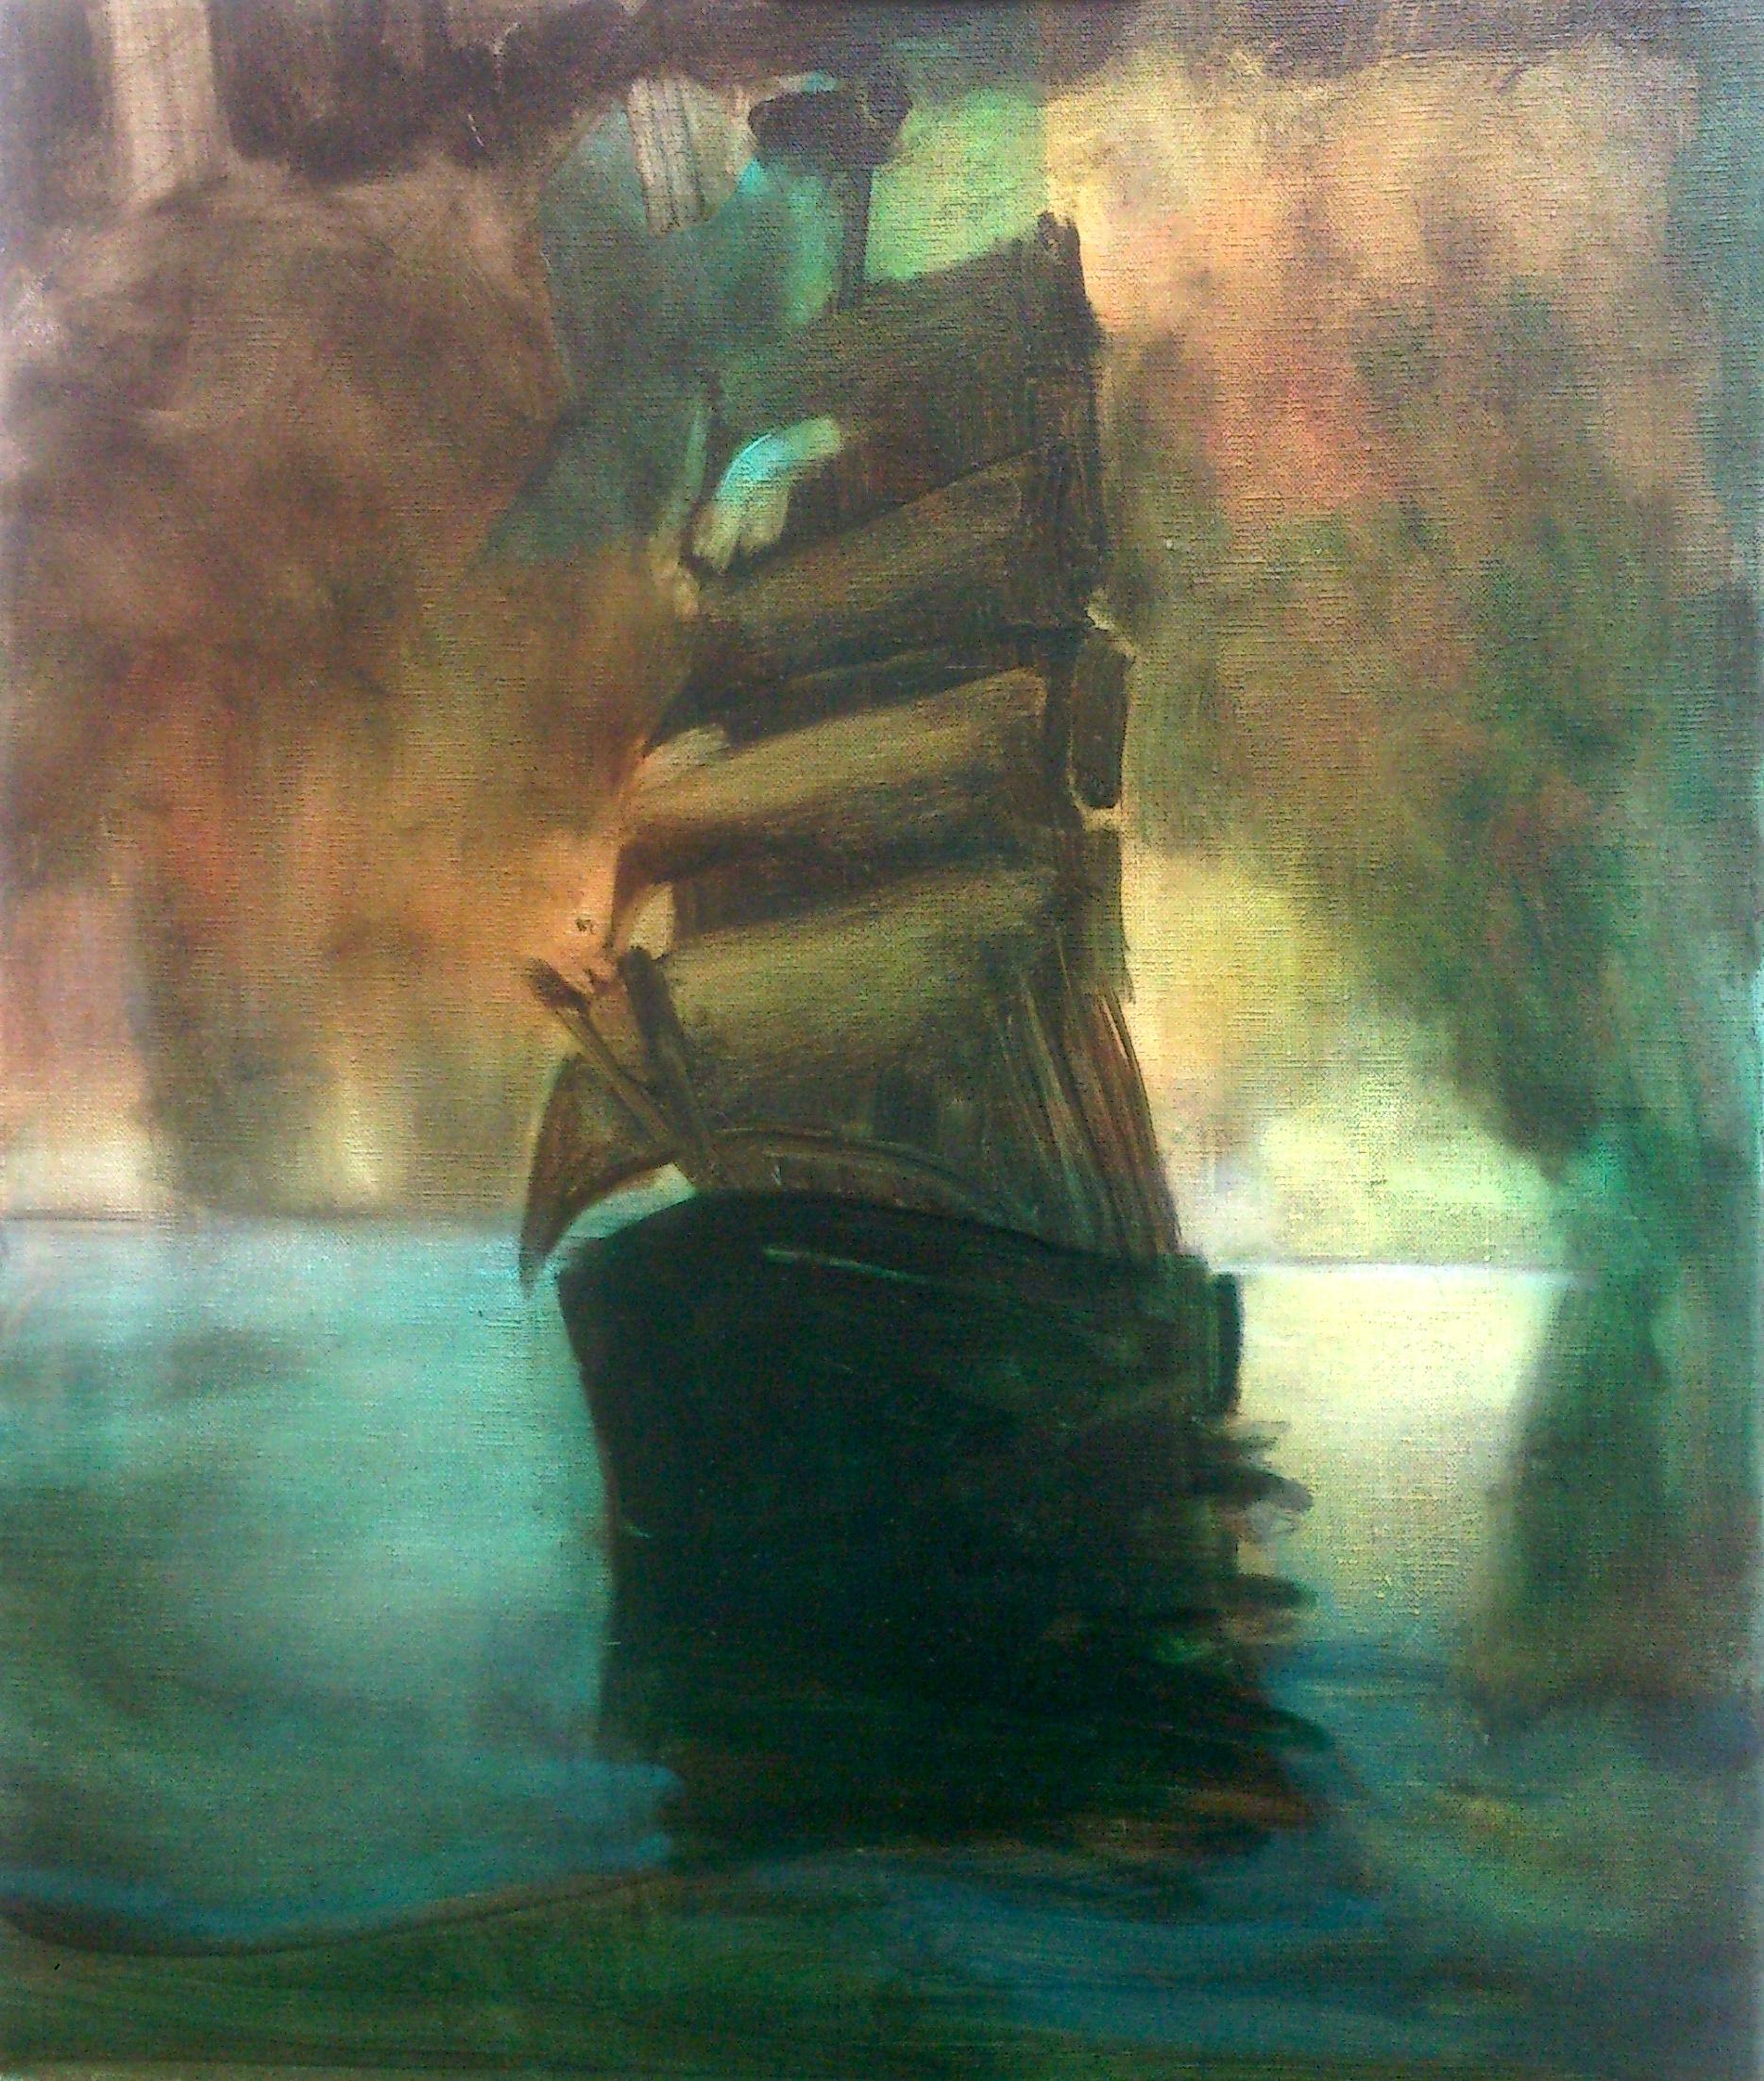 Simulated barque oil on canvas 50x60cm 2015.JPG